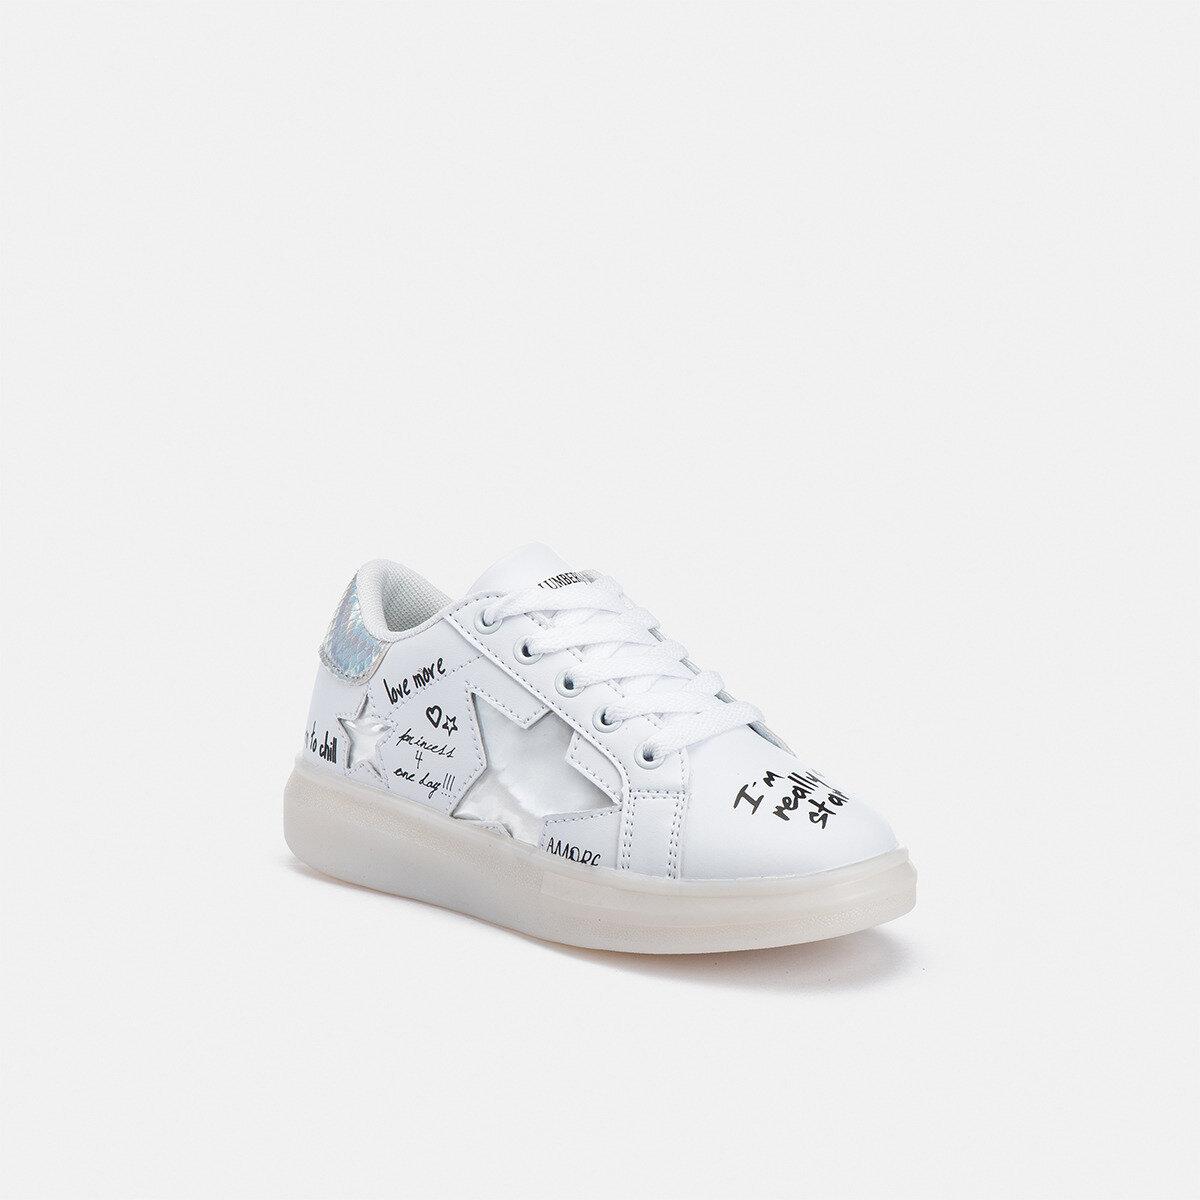 WRITER WHITE/SILVER Girl Sneakers